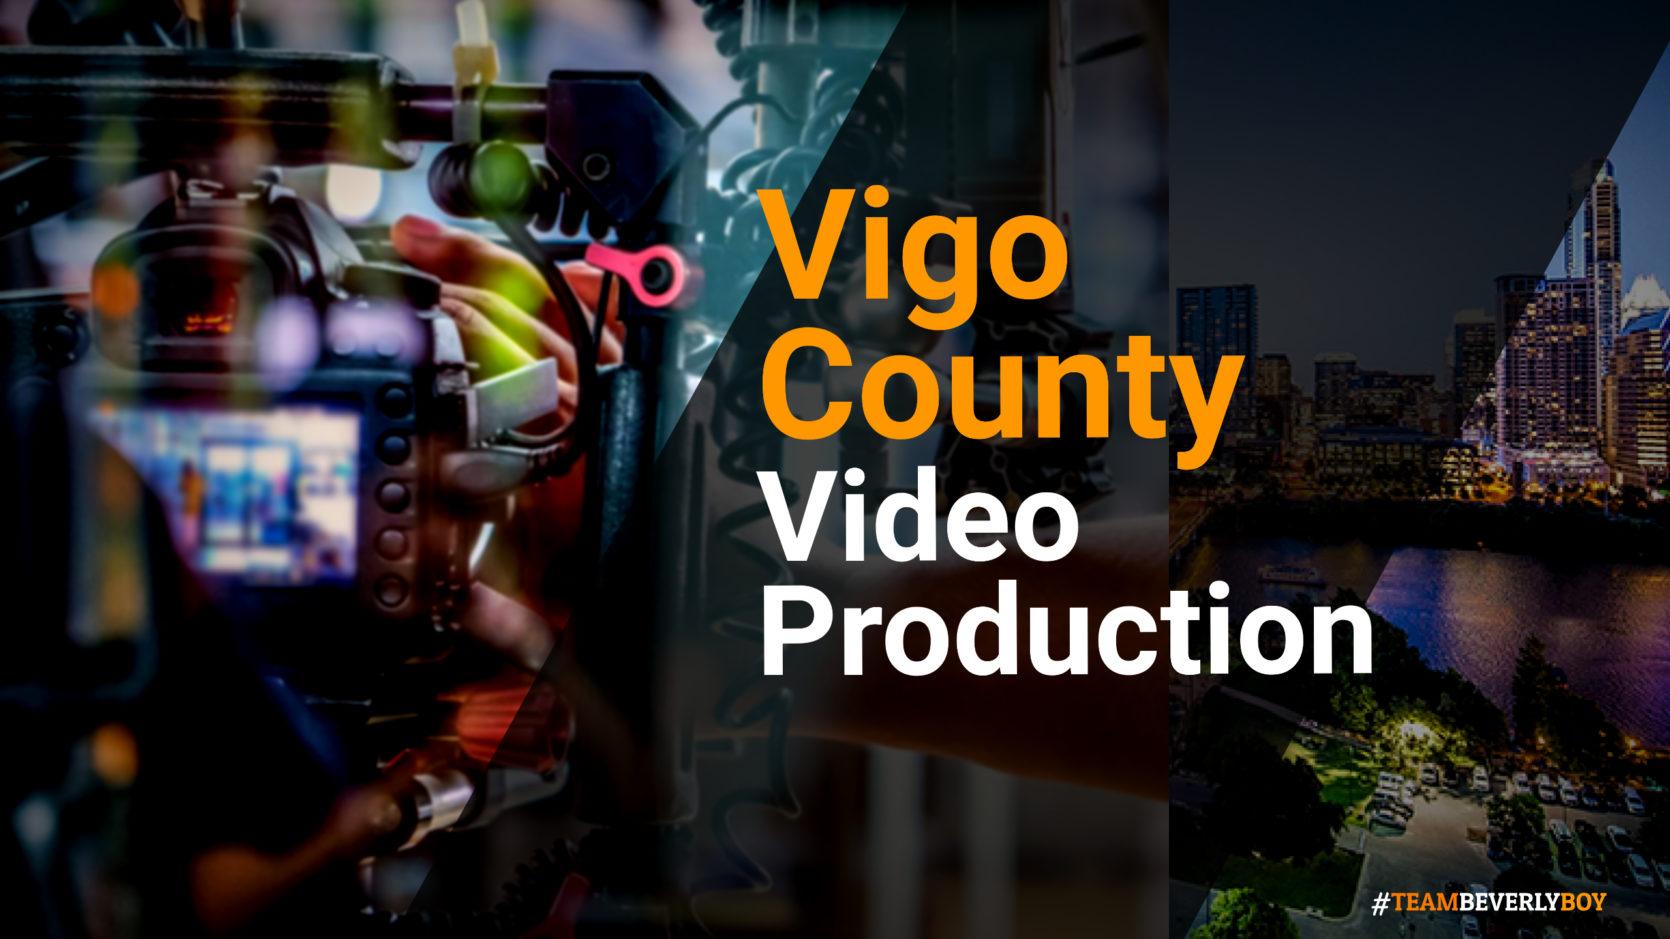 Vigo County Video production